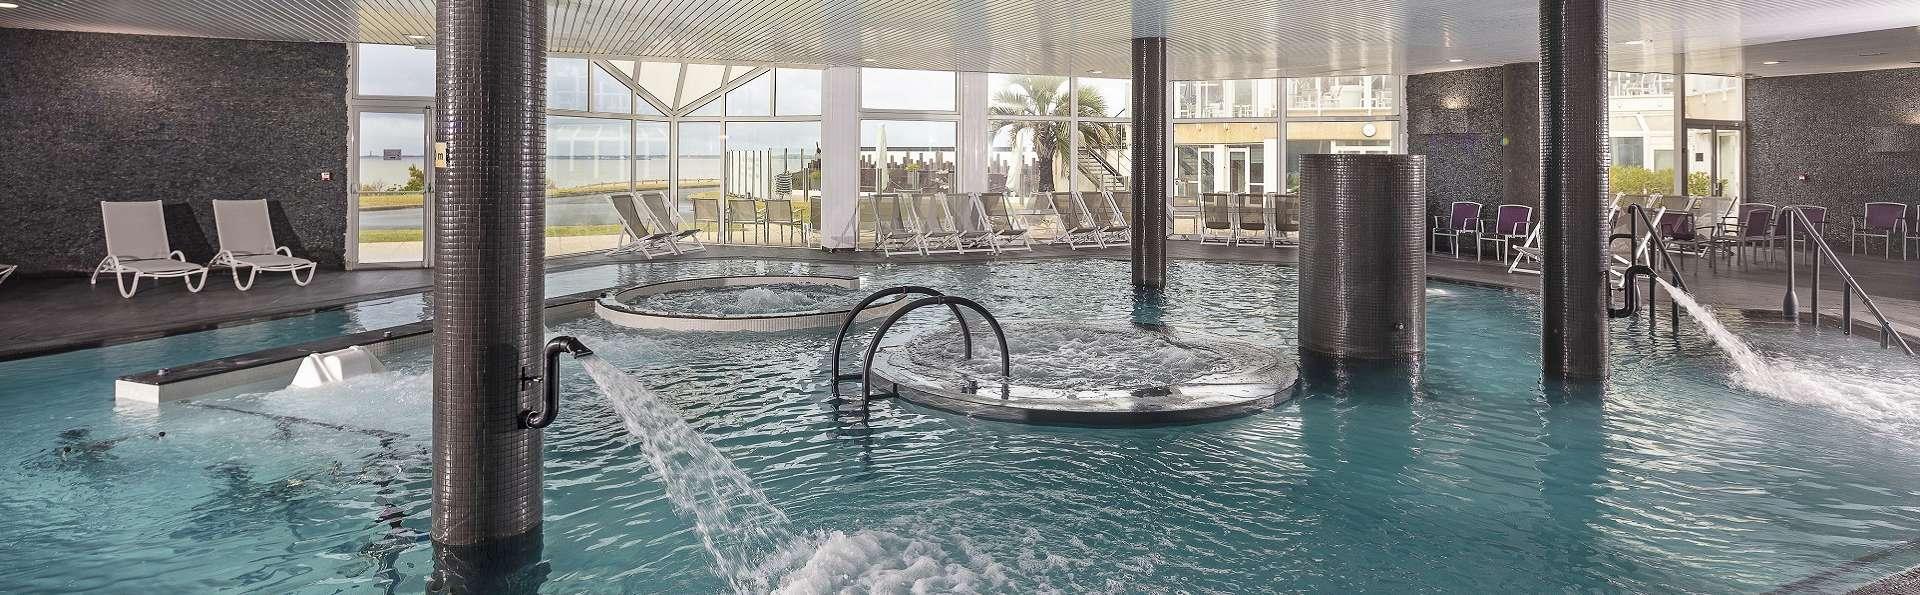 Hôtel Cordouan & Spa by Thalazur - EDIT_spa.jpg